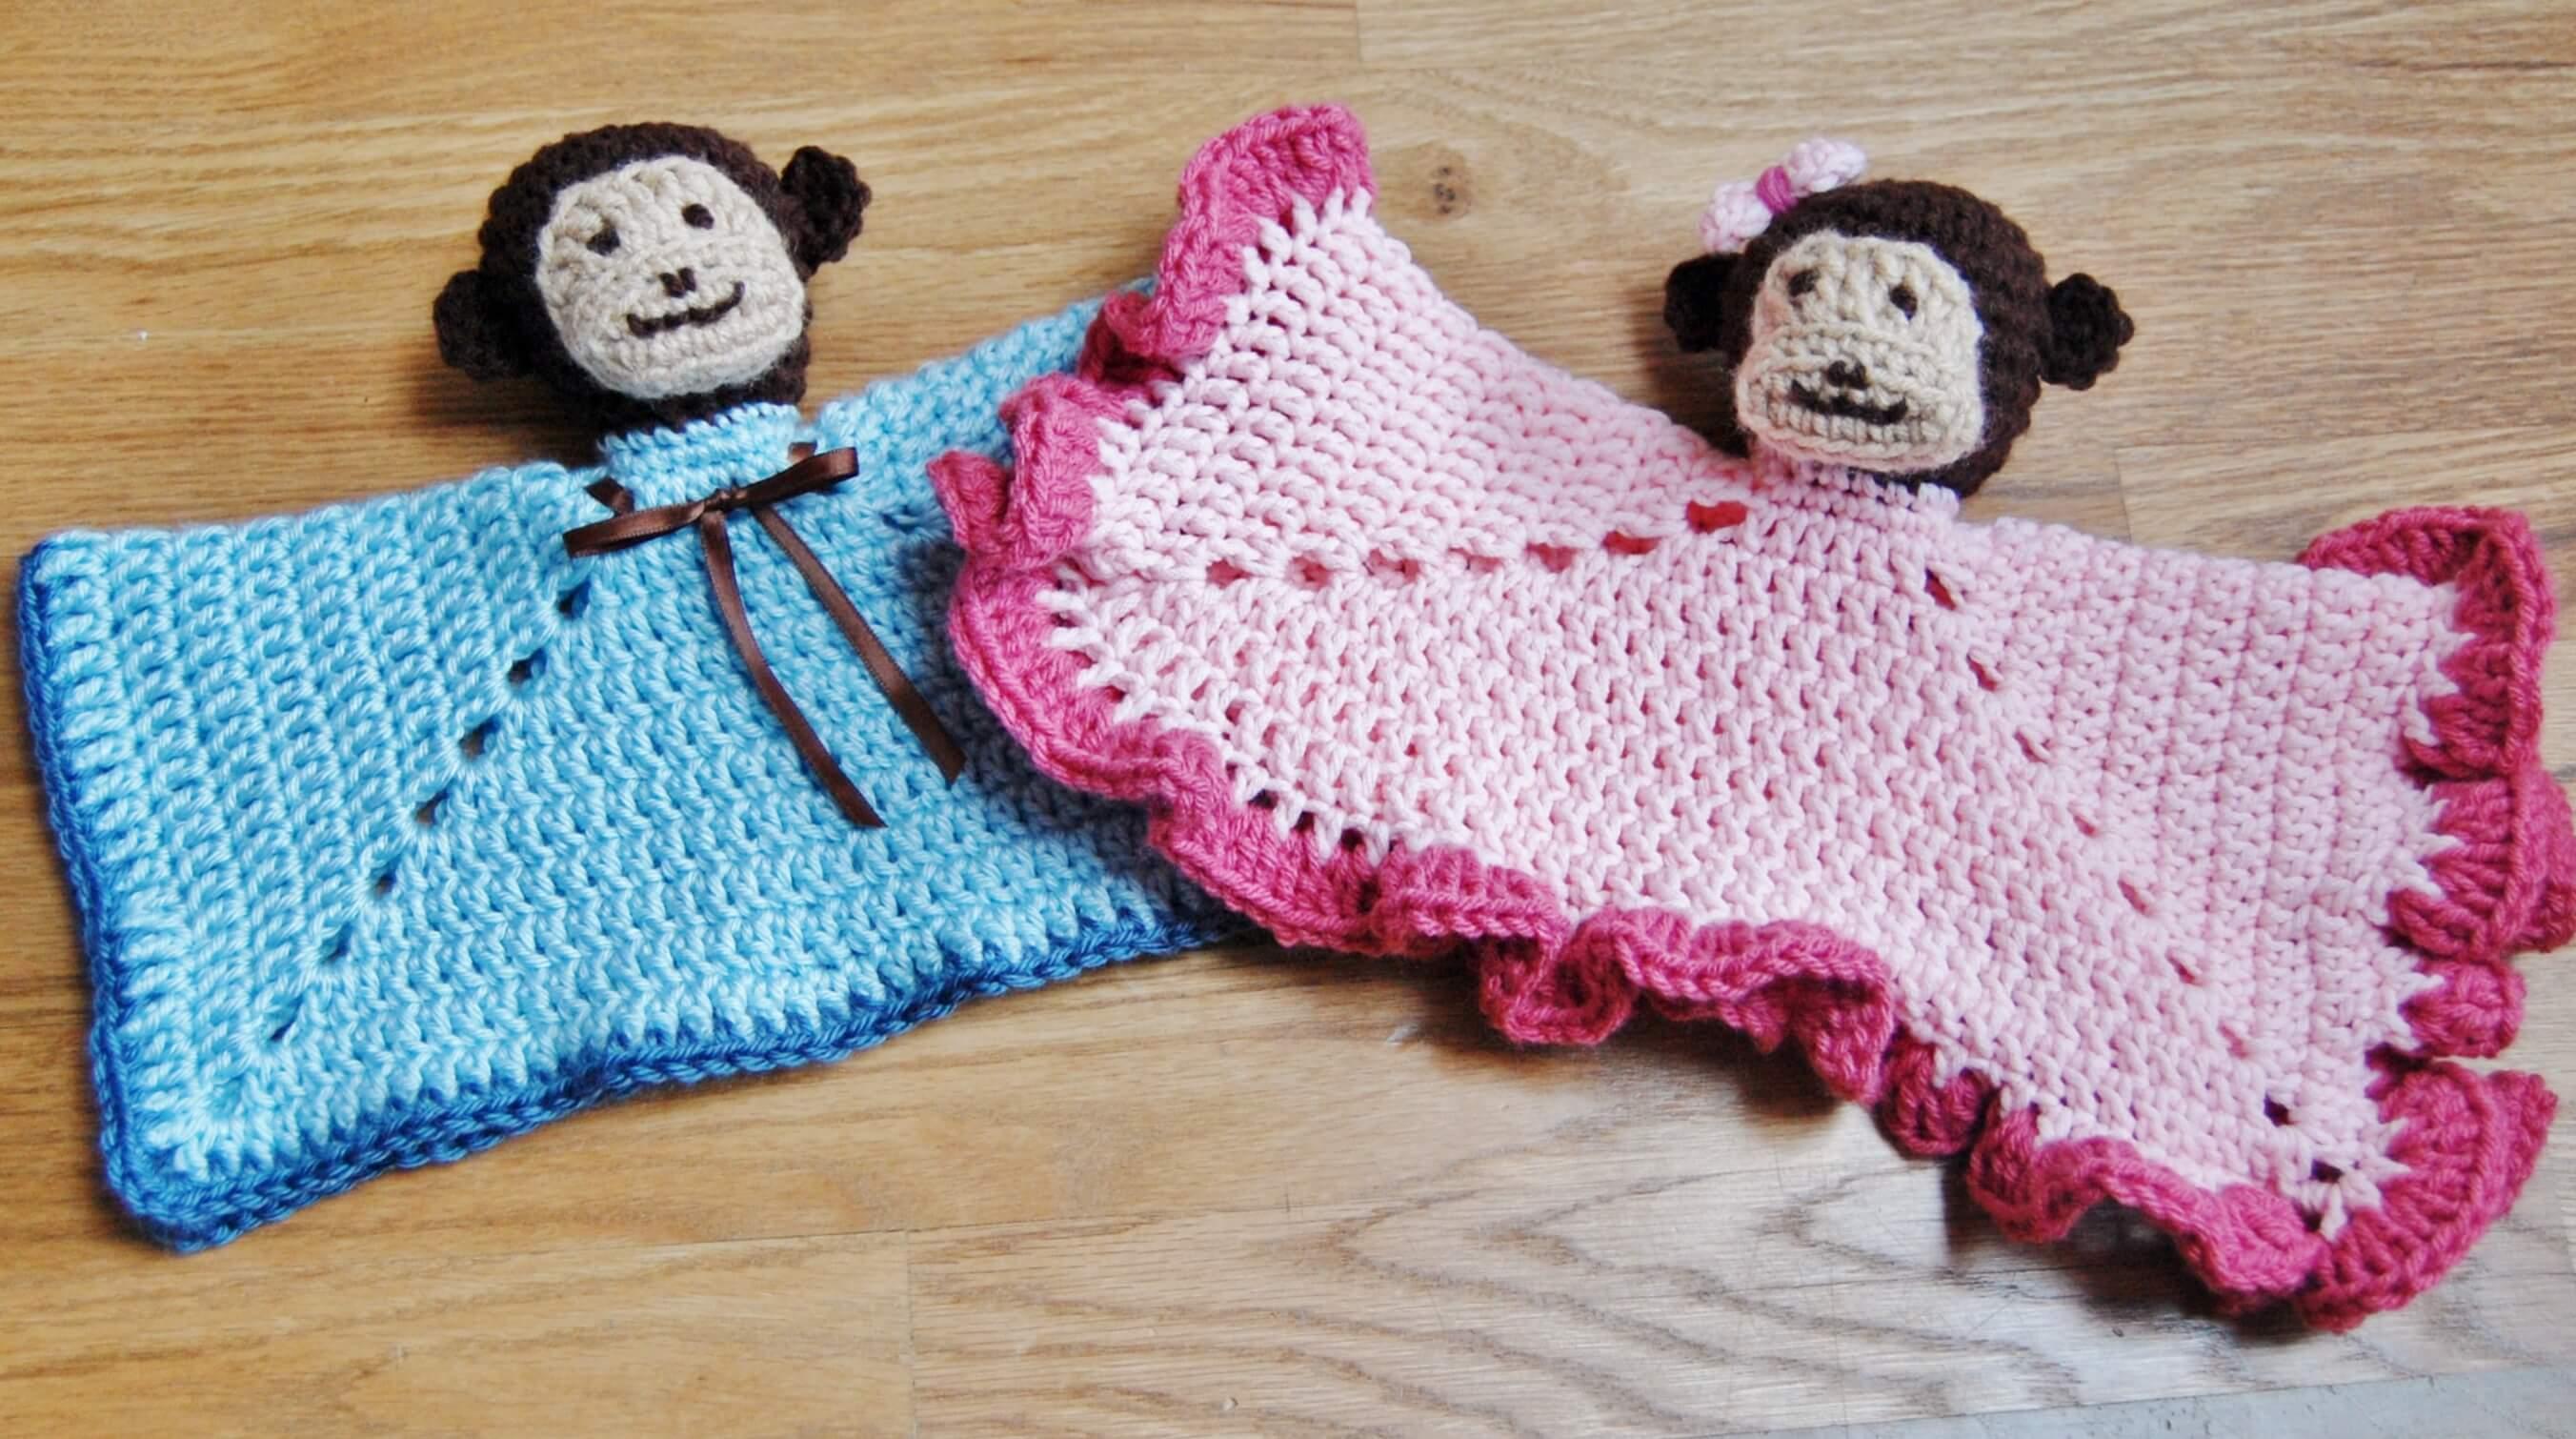 Monkey Crochet Lovey Pattern - Petals to Picots